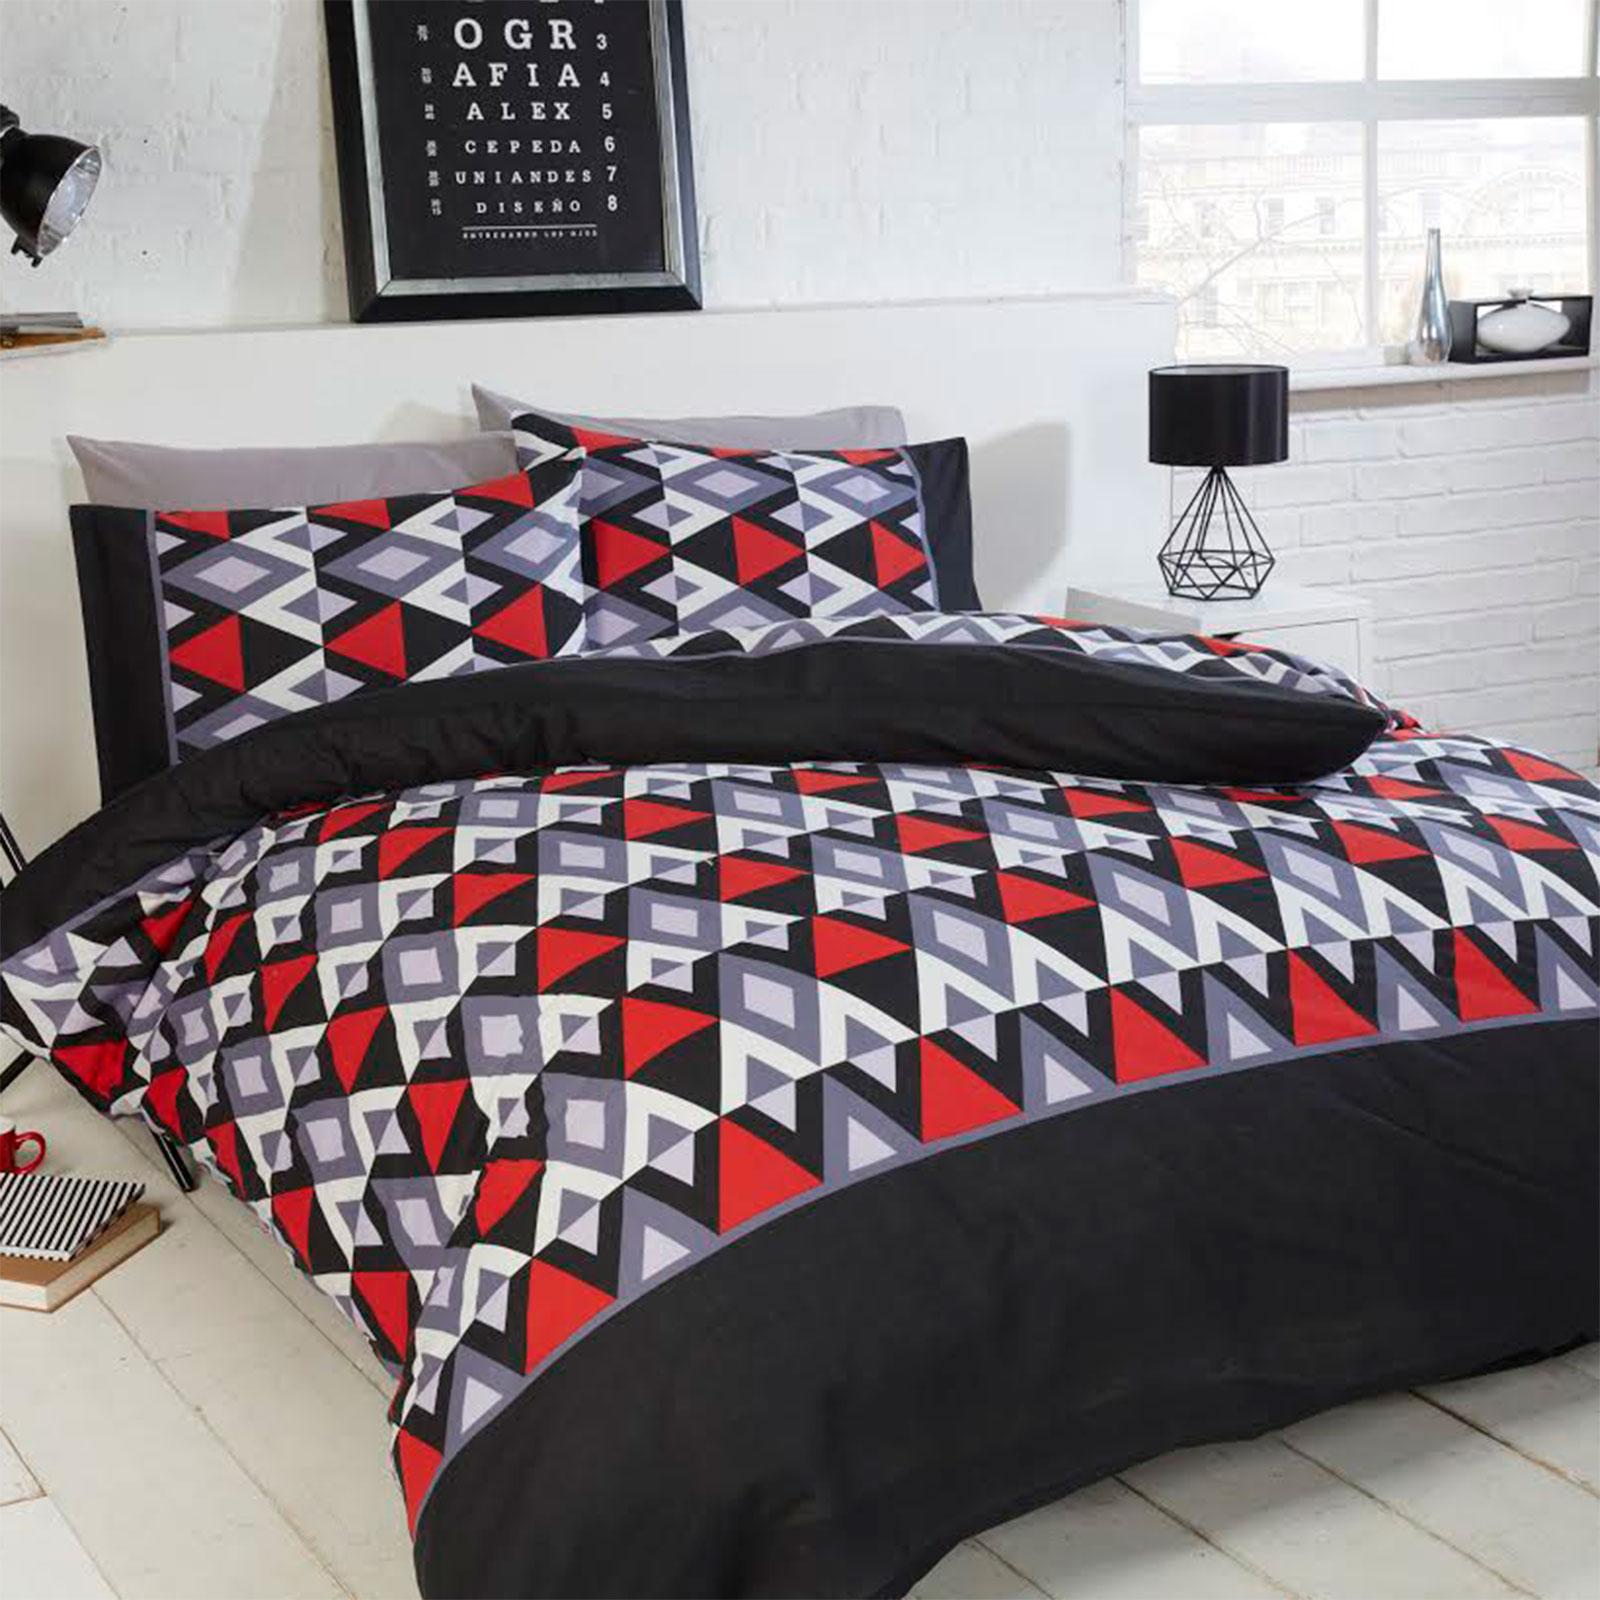 Unique Geometric Styled Duvet Cover Bedding Set with Aztec ...